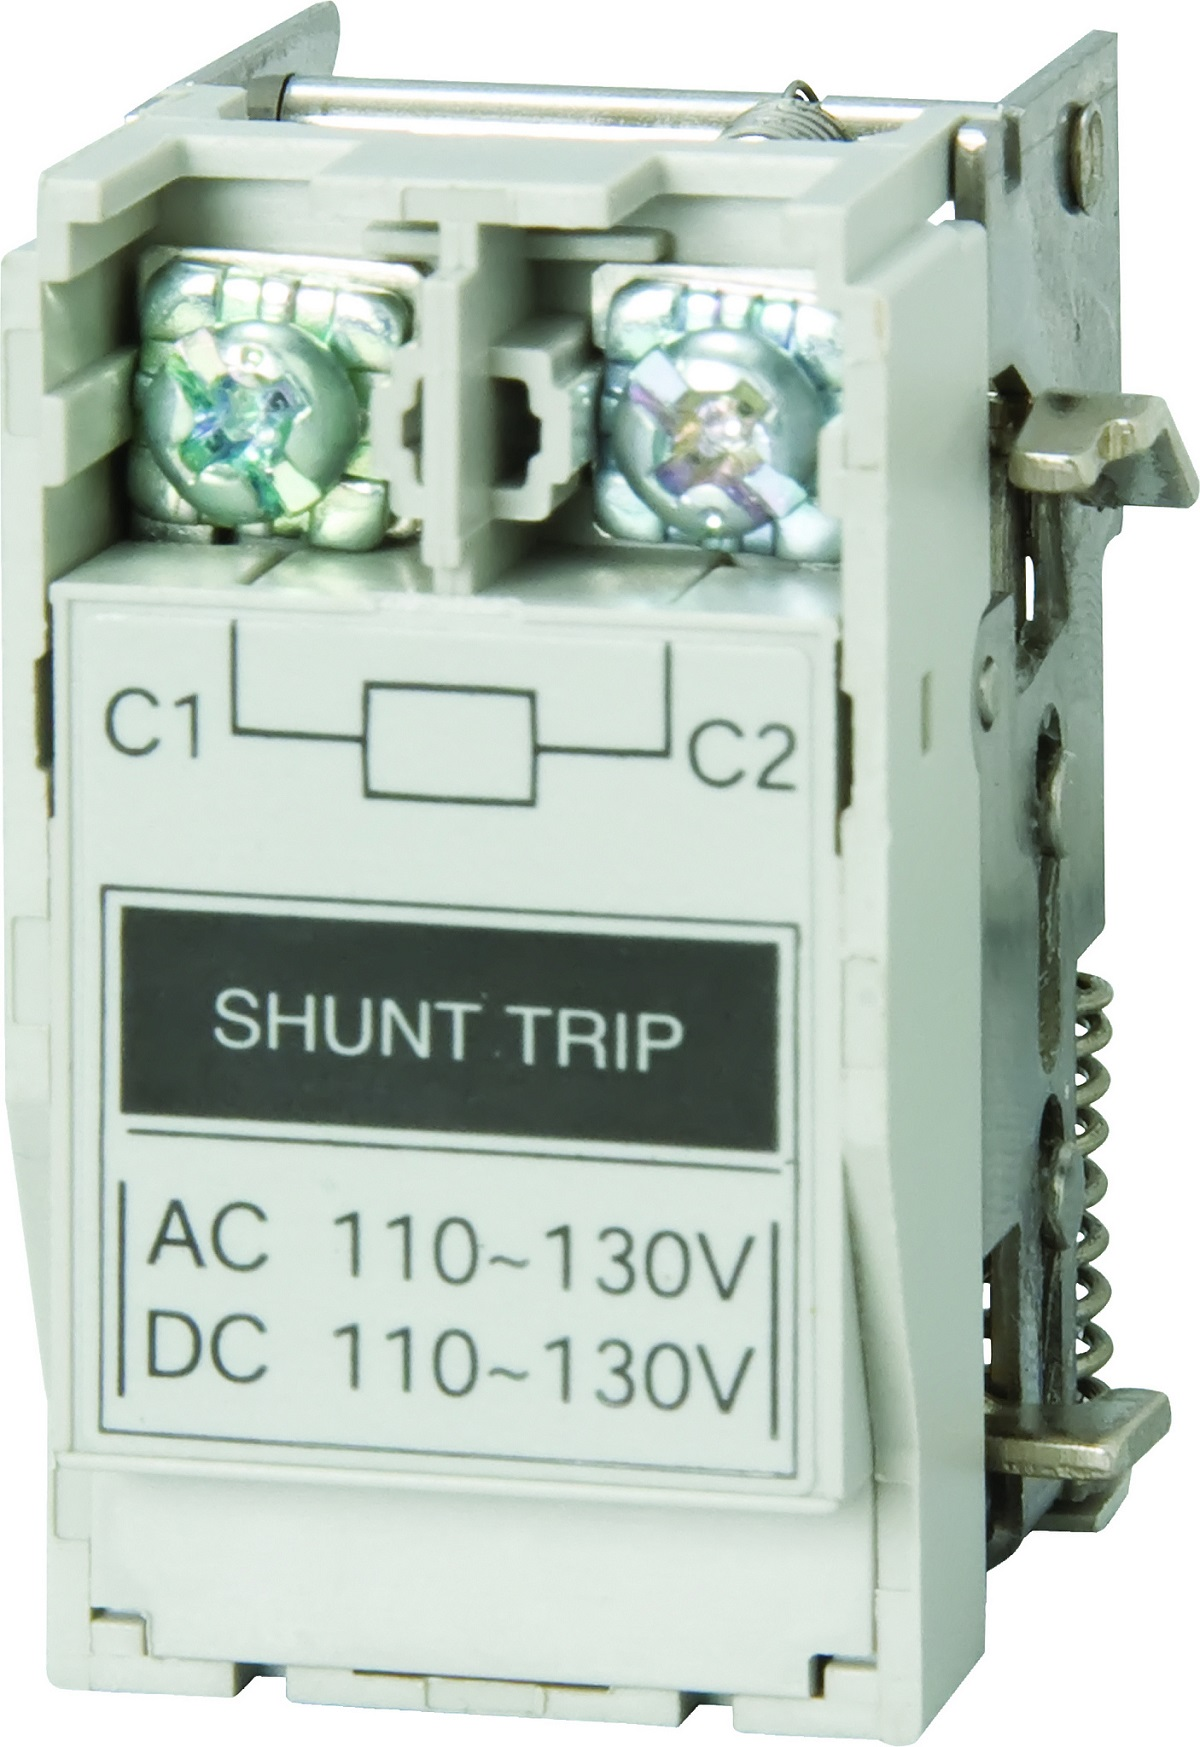 WEG Electric Circuit Breaker Accessories